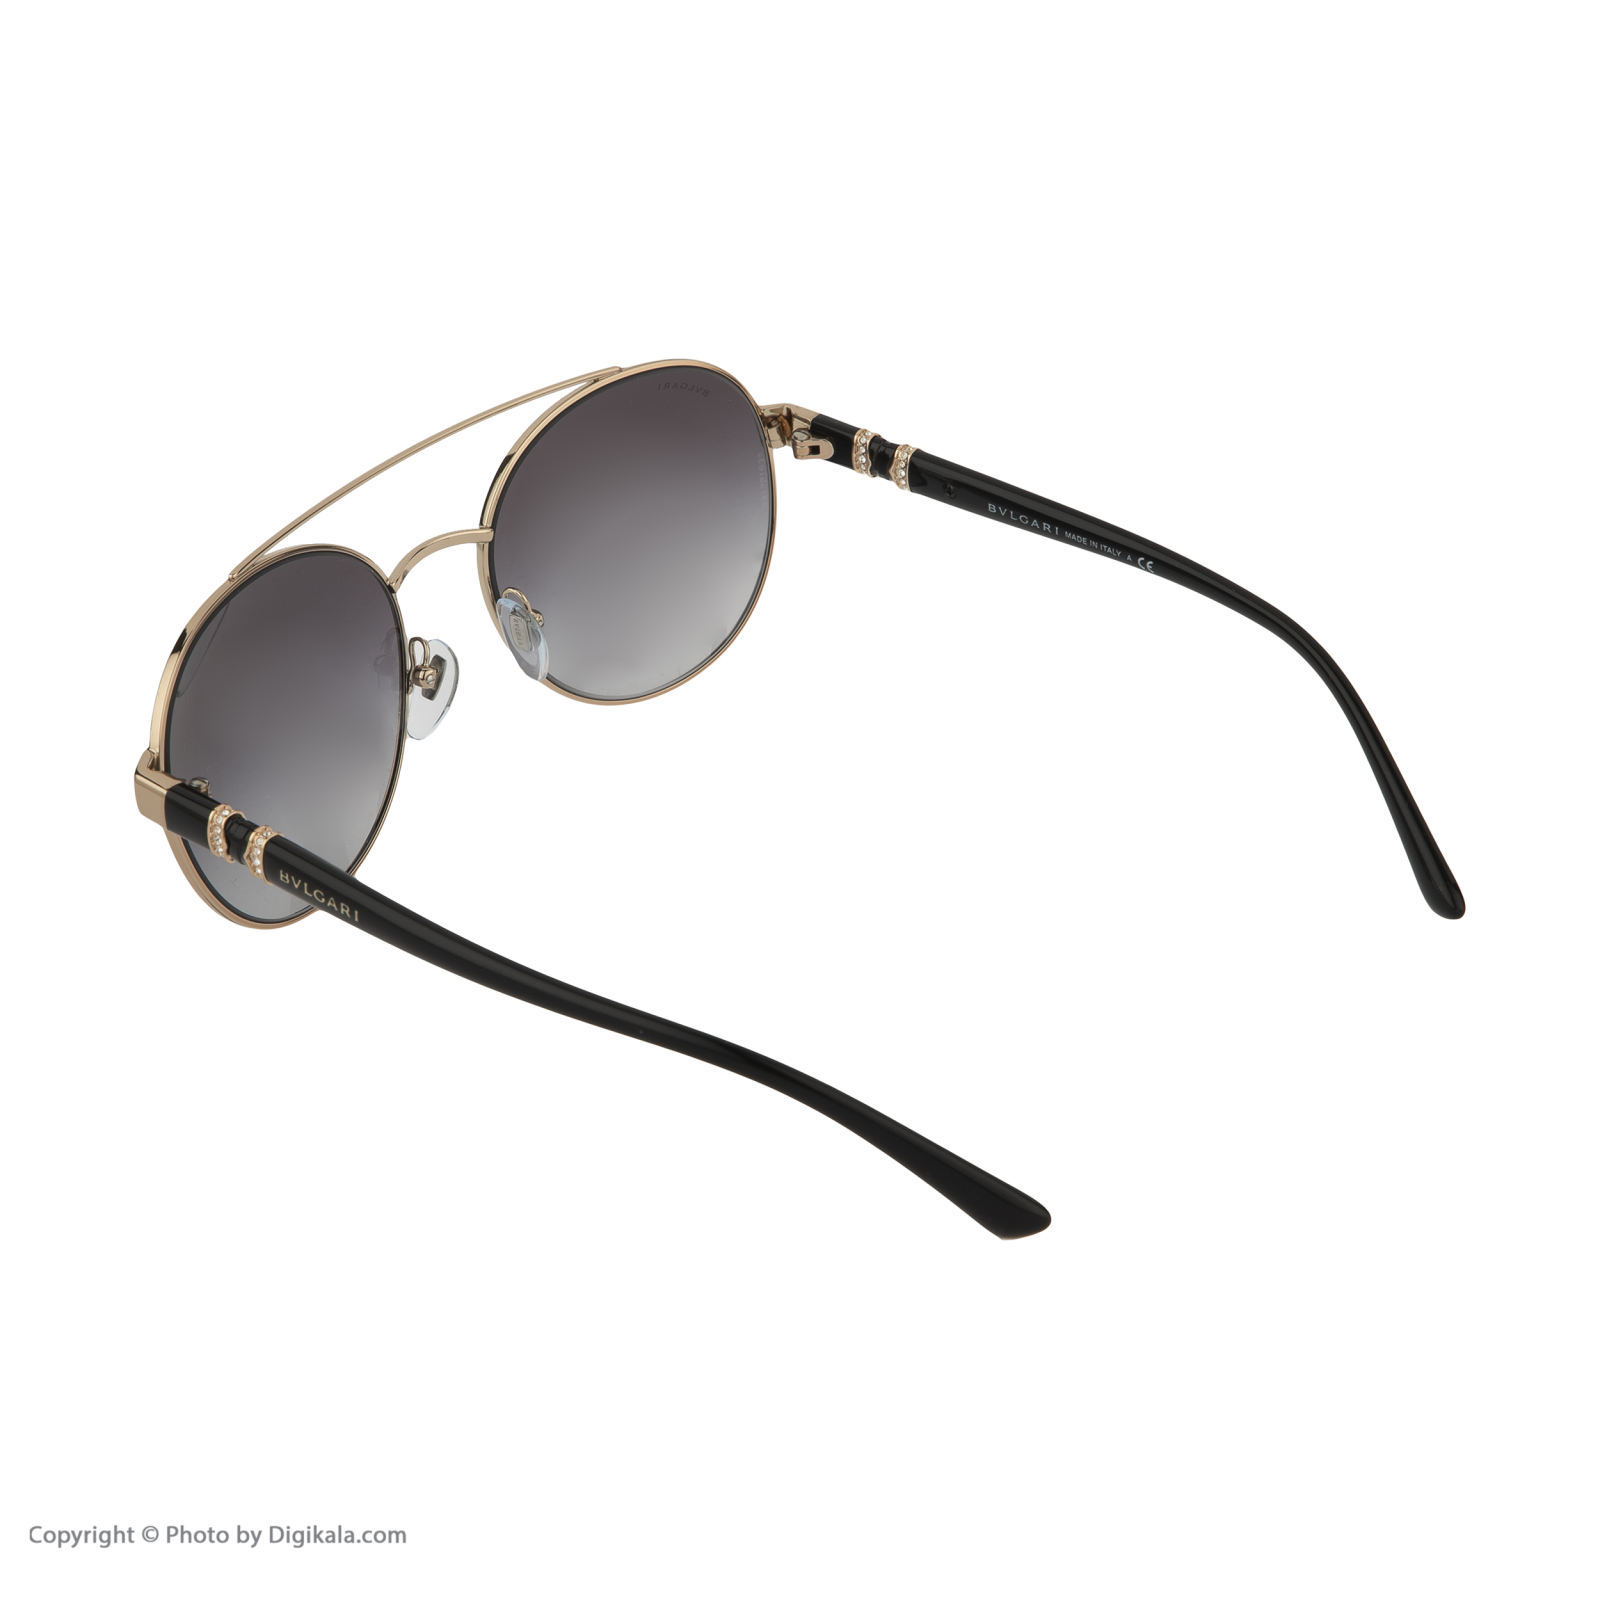 عینک آفتابی زنانه بولگاری مدل BV6085B 20238G -  - 4